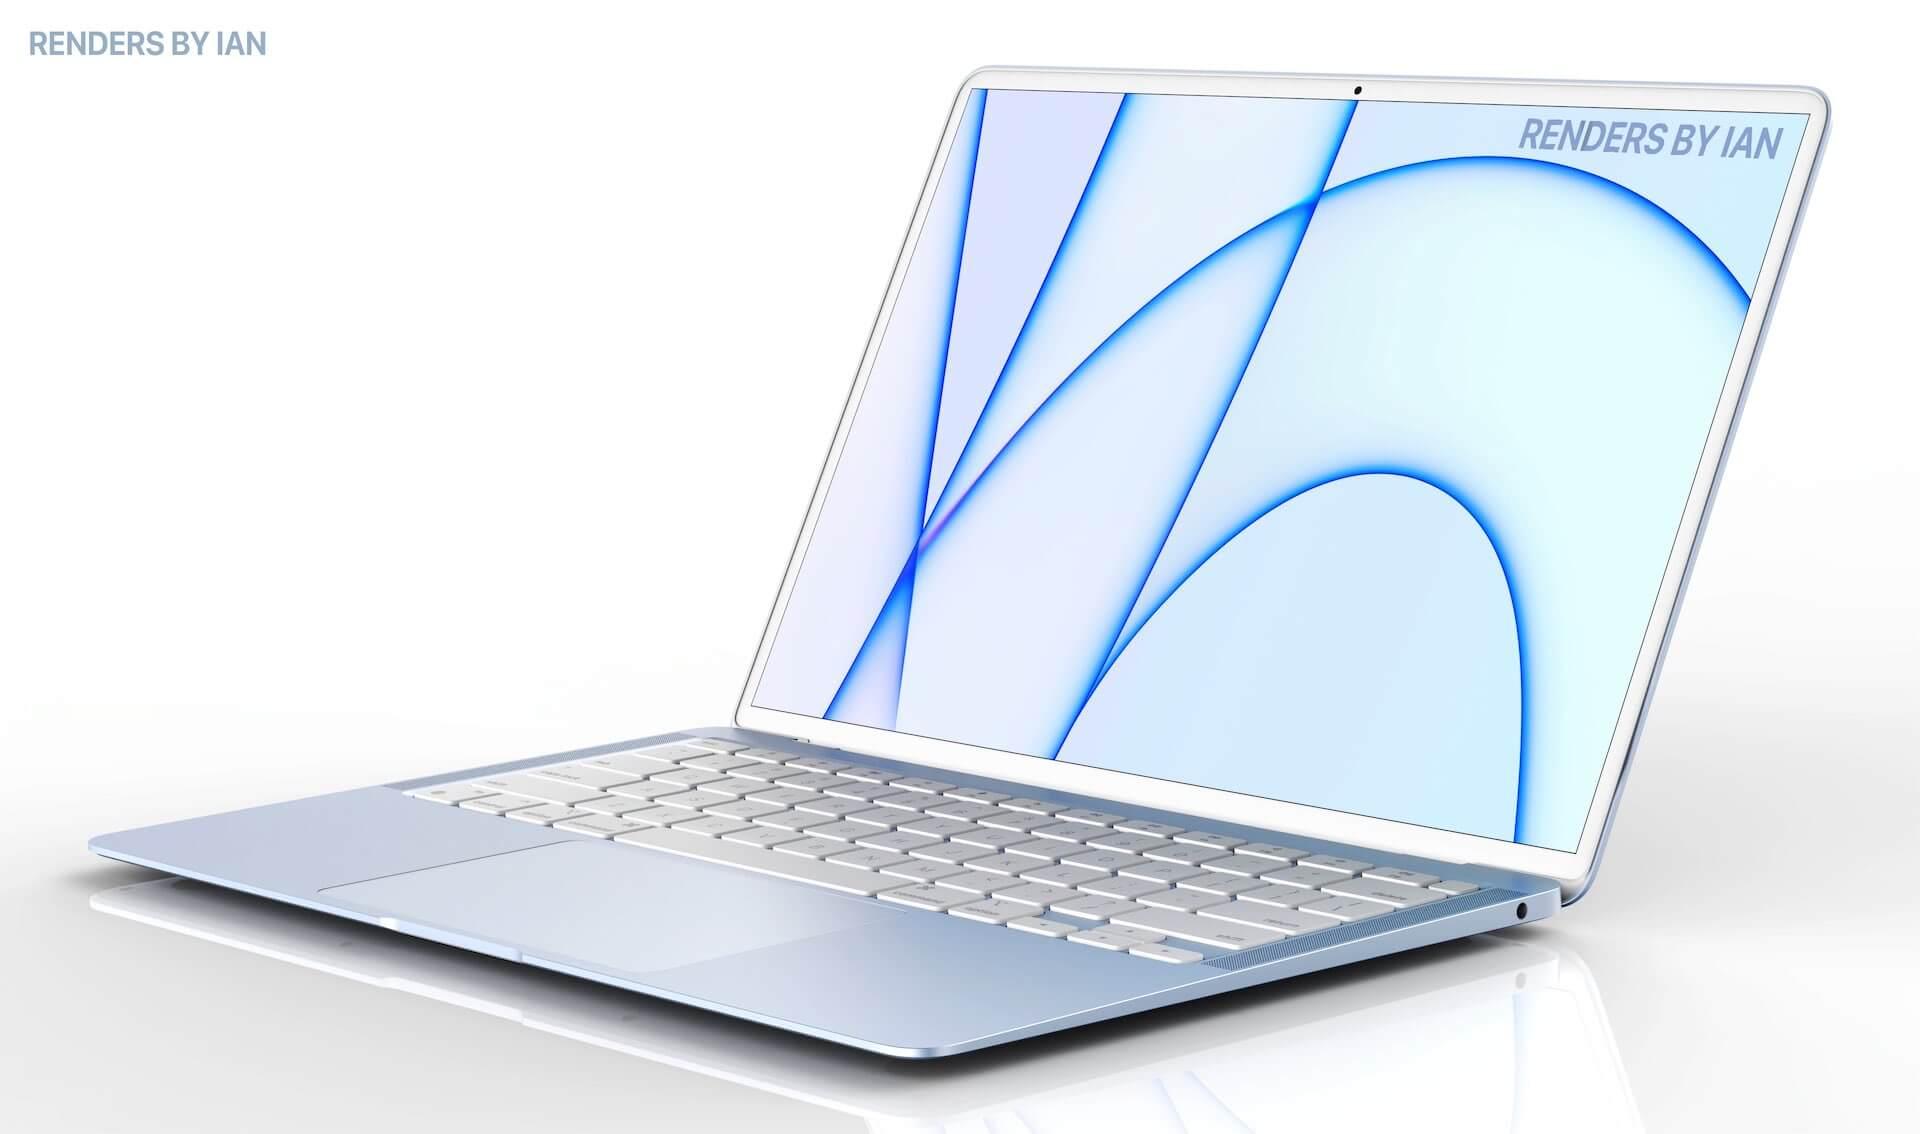 M2チップ搭載の新型MacBookが今年中に登場!?iMac同様複数のカラーバリエーションも? tech210510_macbookair_1